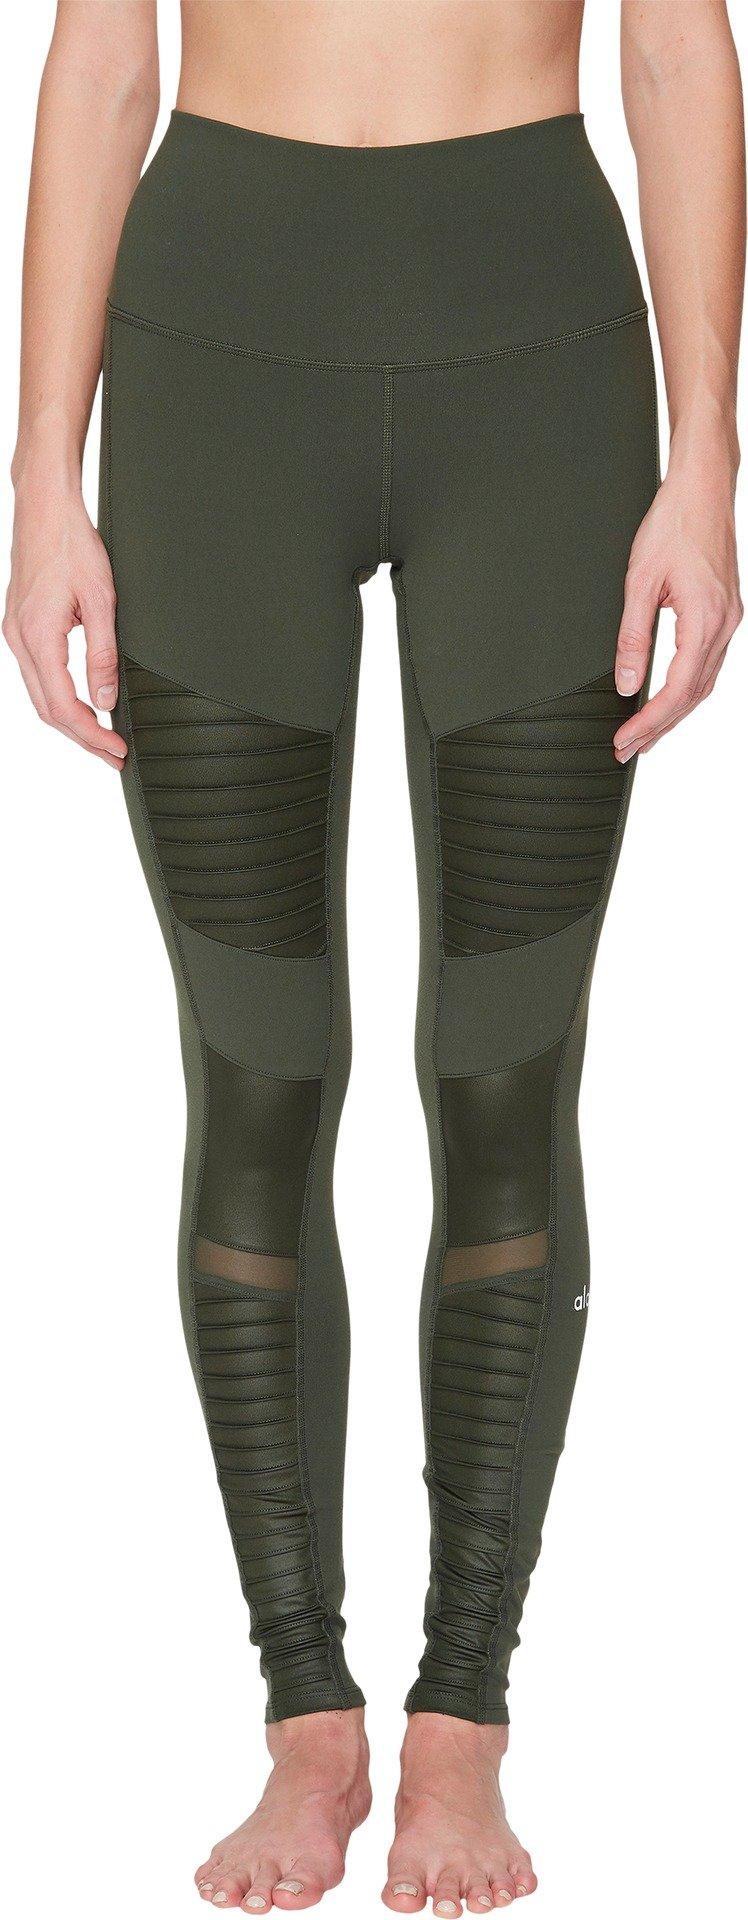 ALO Women's High Waisted Moto Leggings Hunter/Hunter Glossy X-Small 28